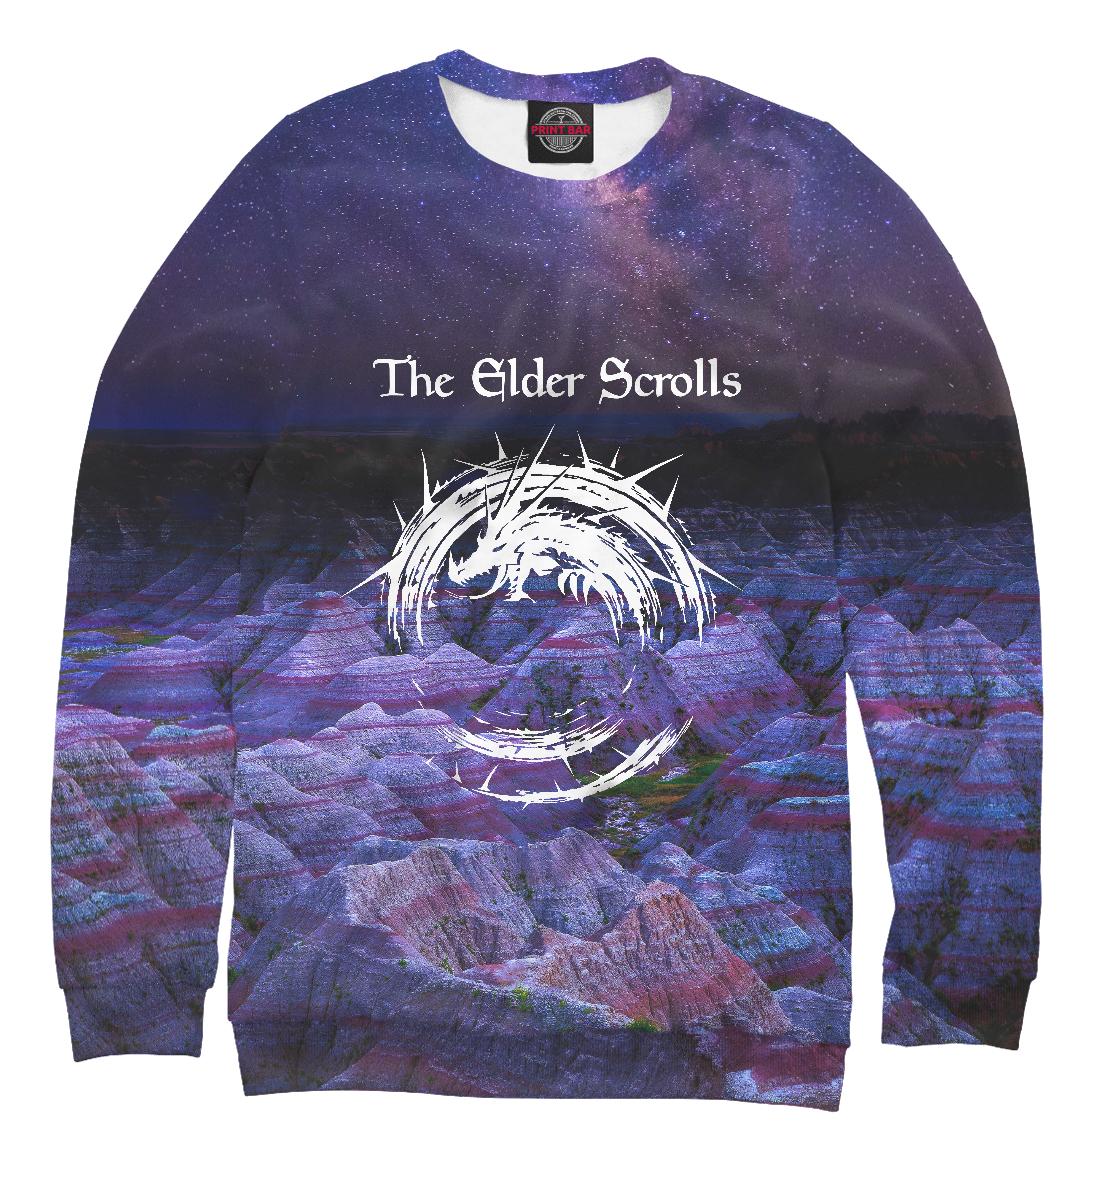 Фото - The Elder Scrolls piotr deja ziuziek the elder scrolls iii przepowiednia